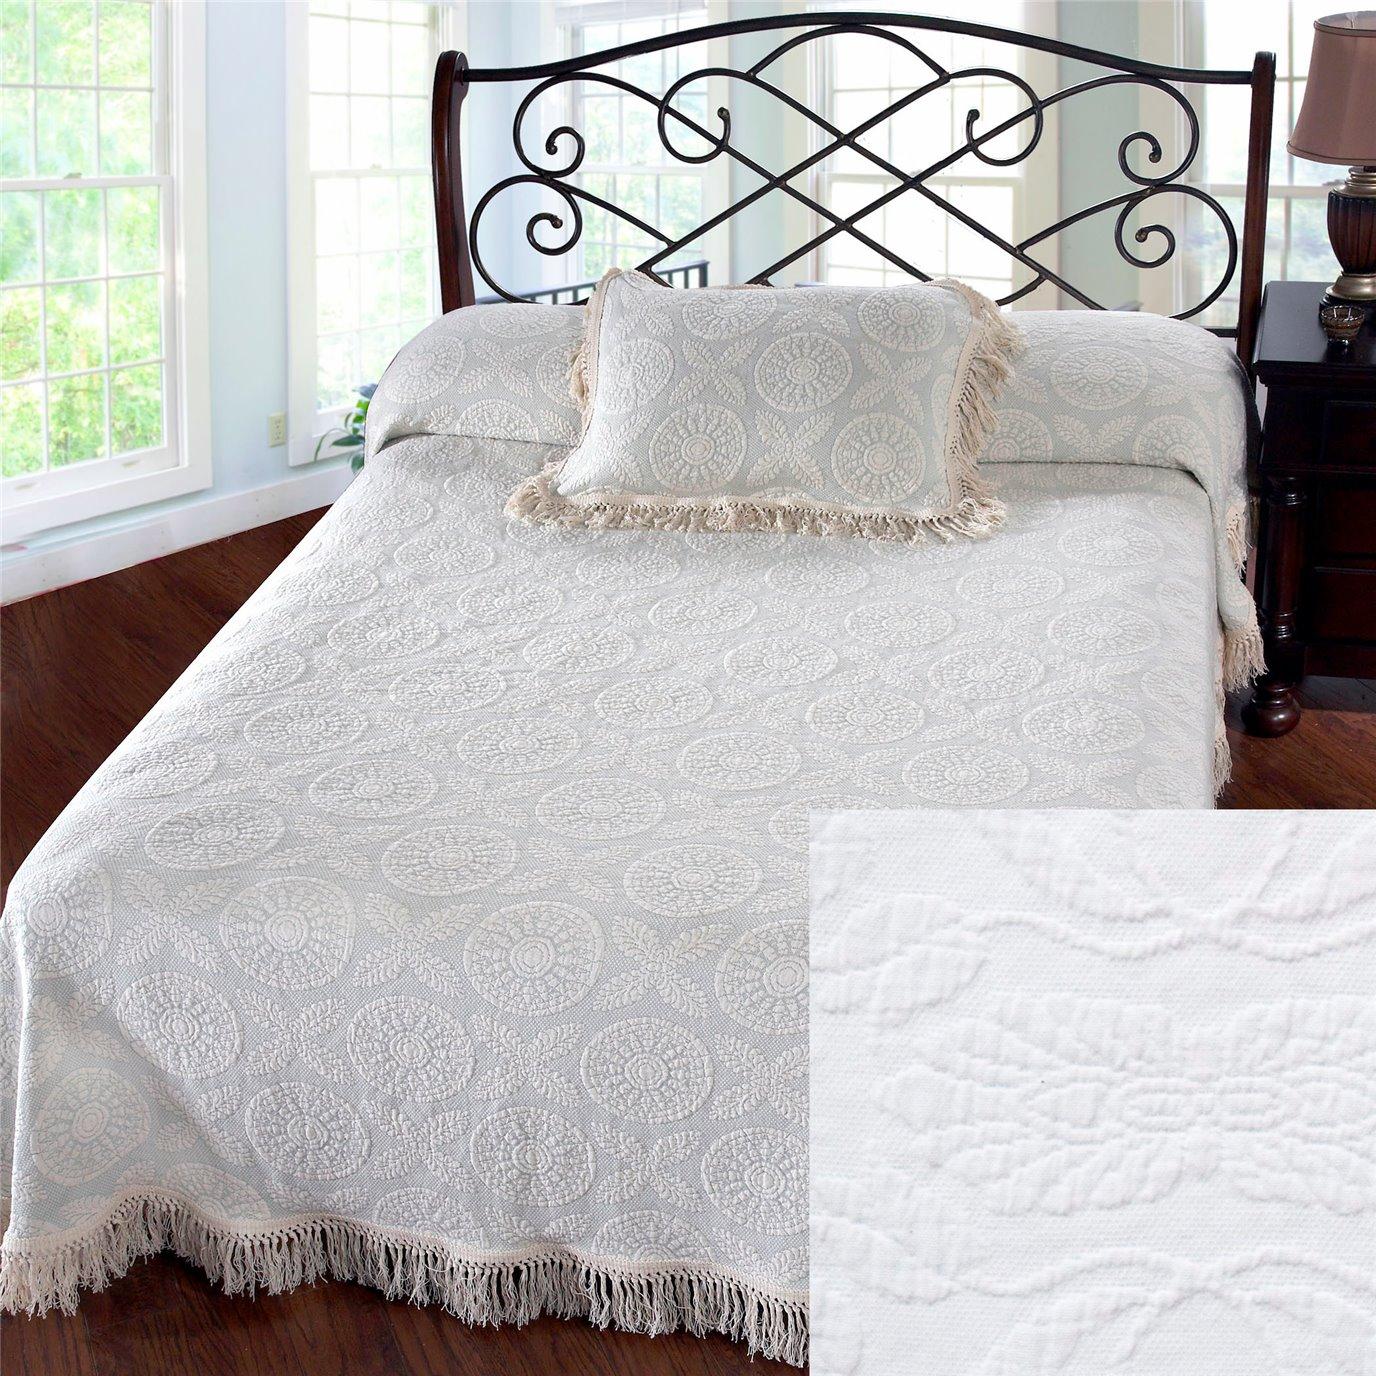 Heirloom King White Bedspread